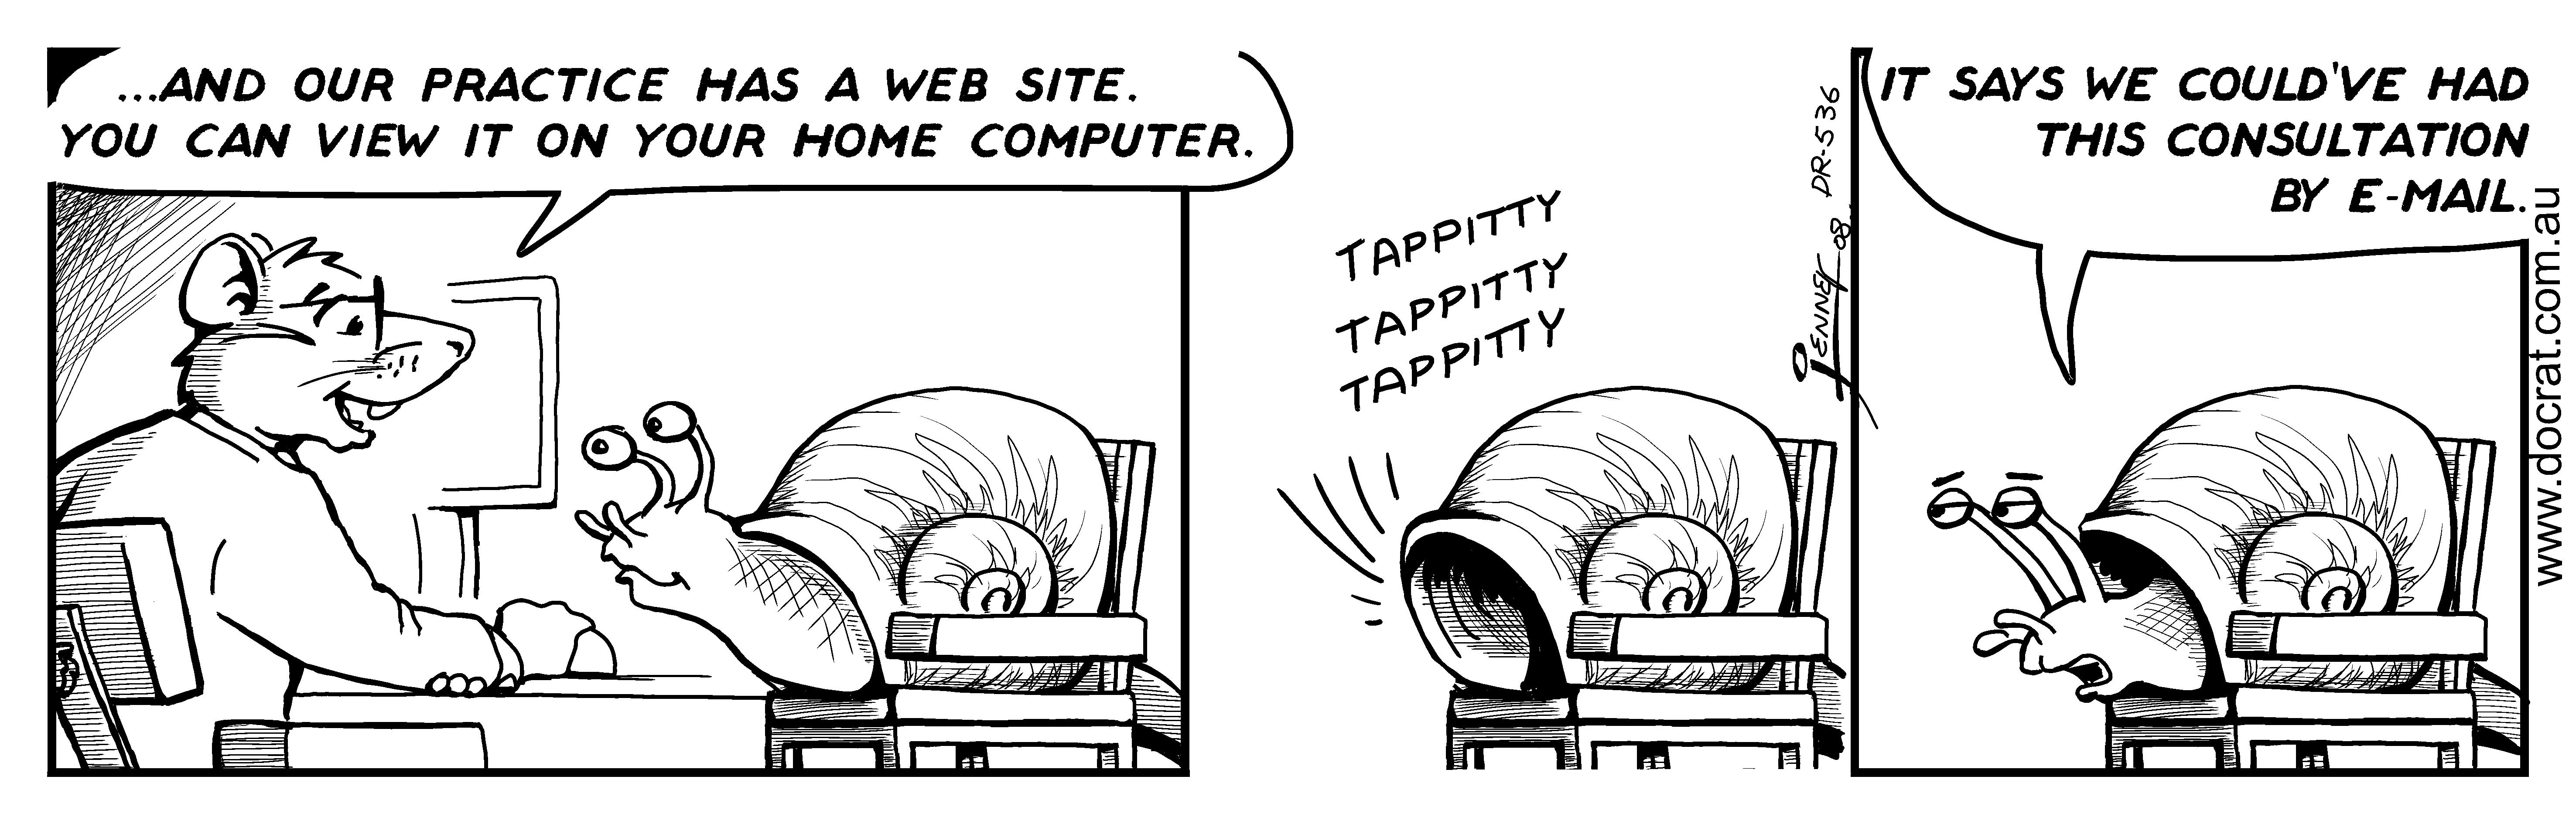 20080714